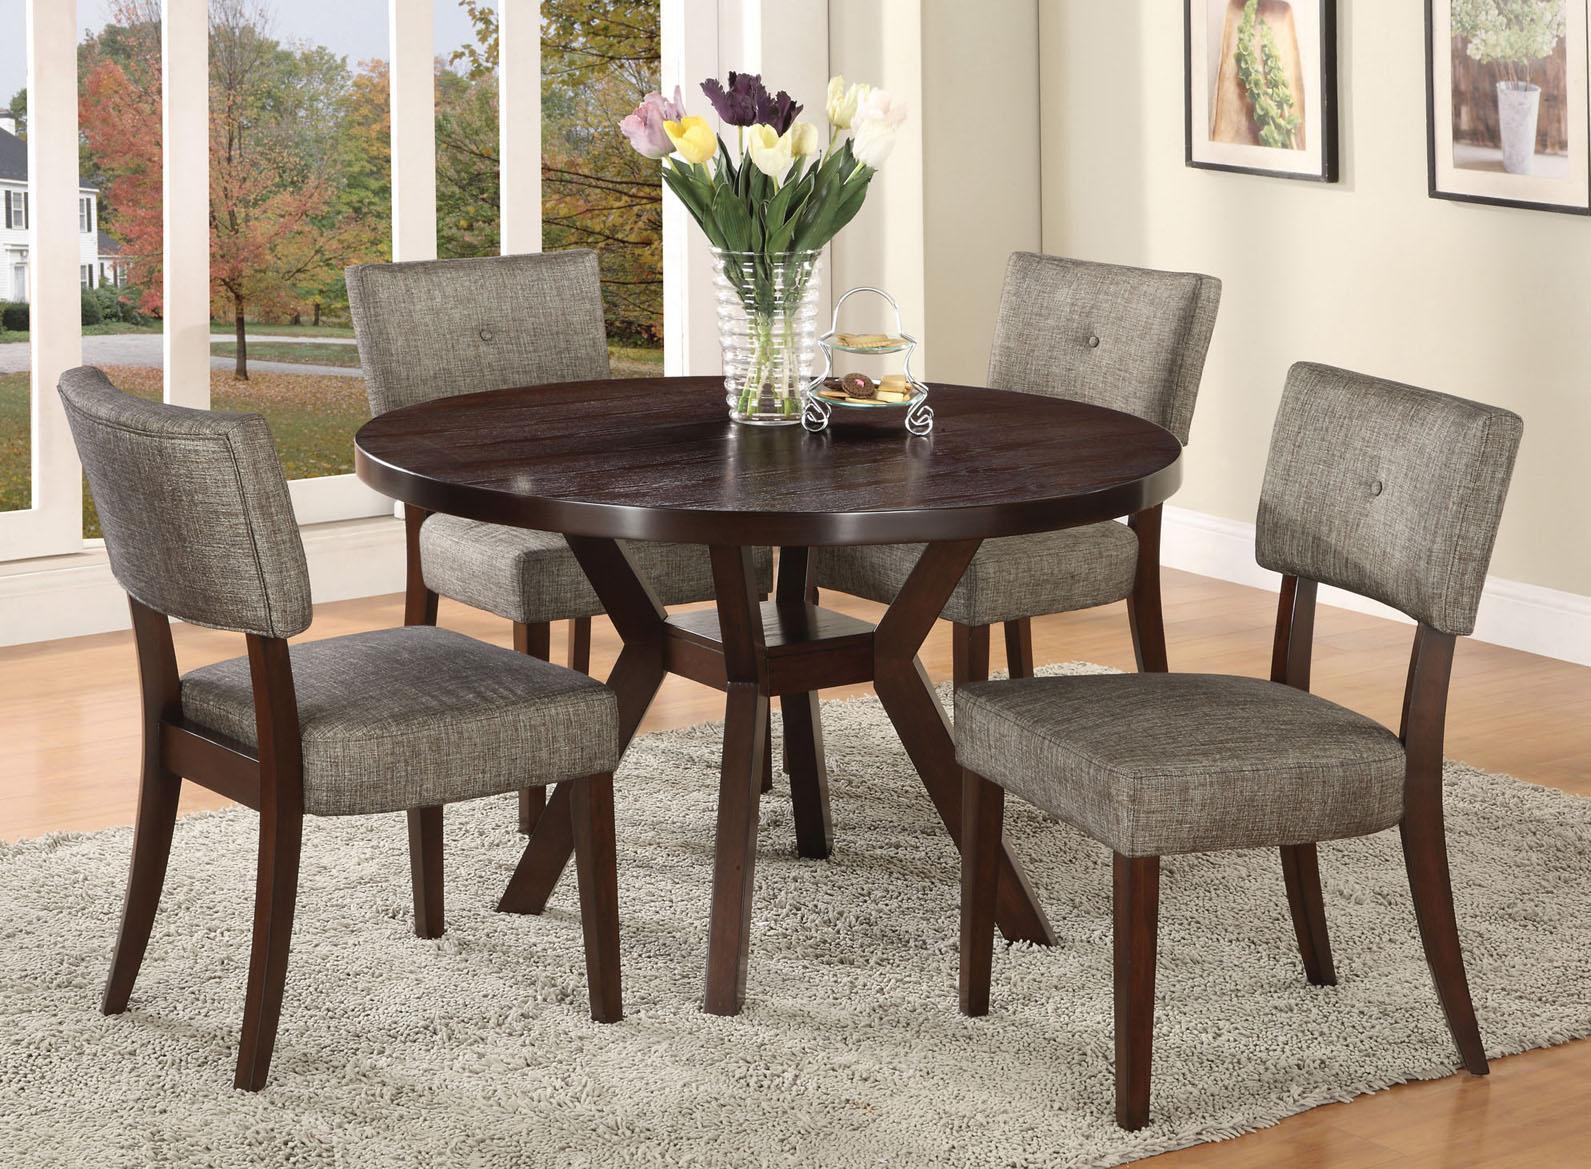 Acme Furniture Drake Espresso 5 Piece Dining Set   Item Number:  16250+4x16252